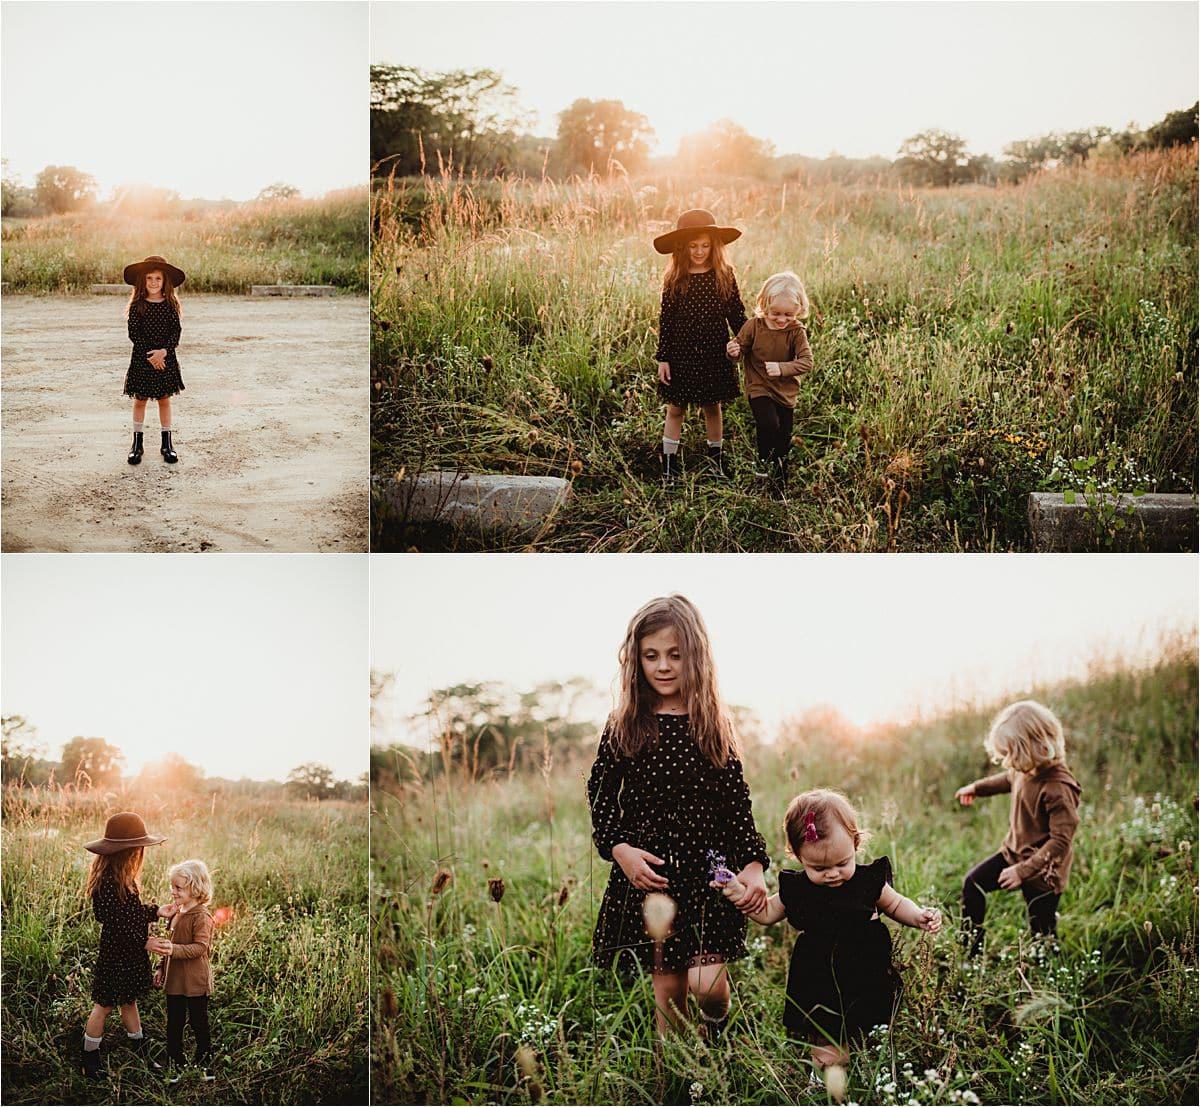 Sibling in Field